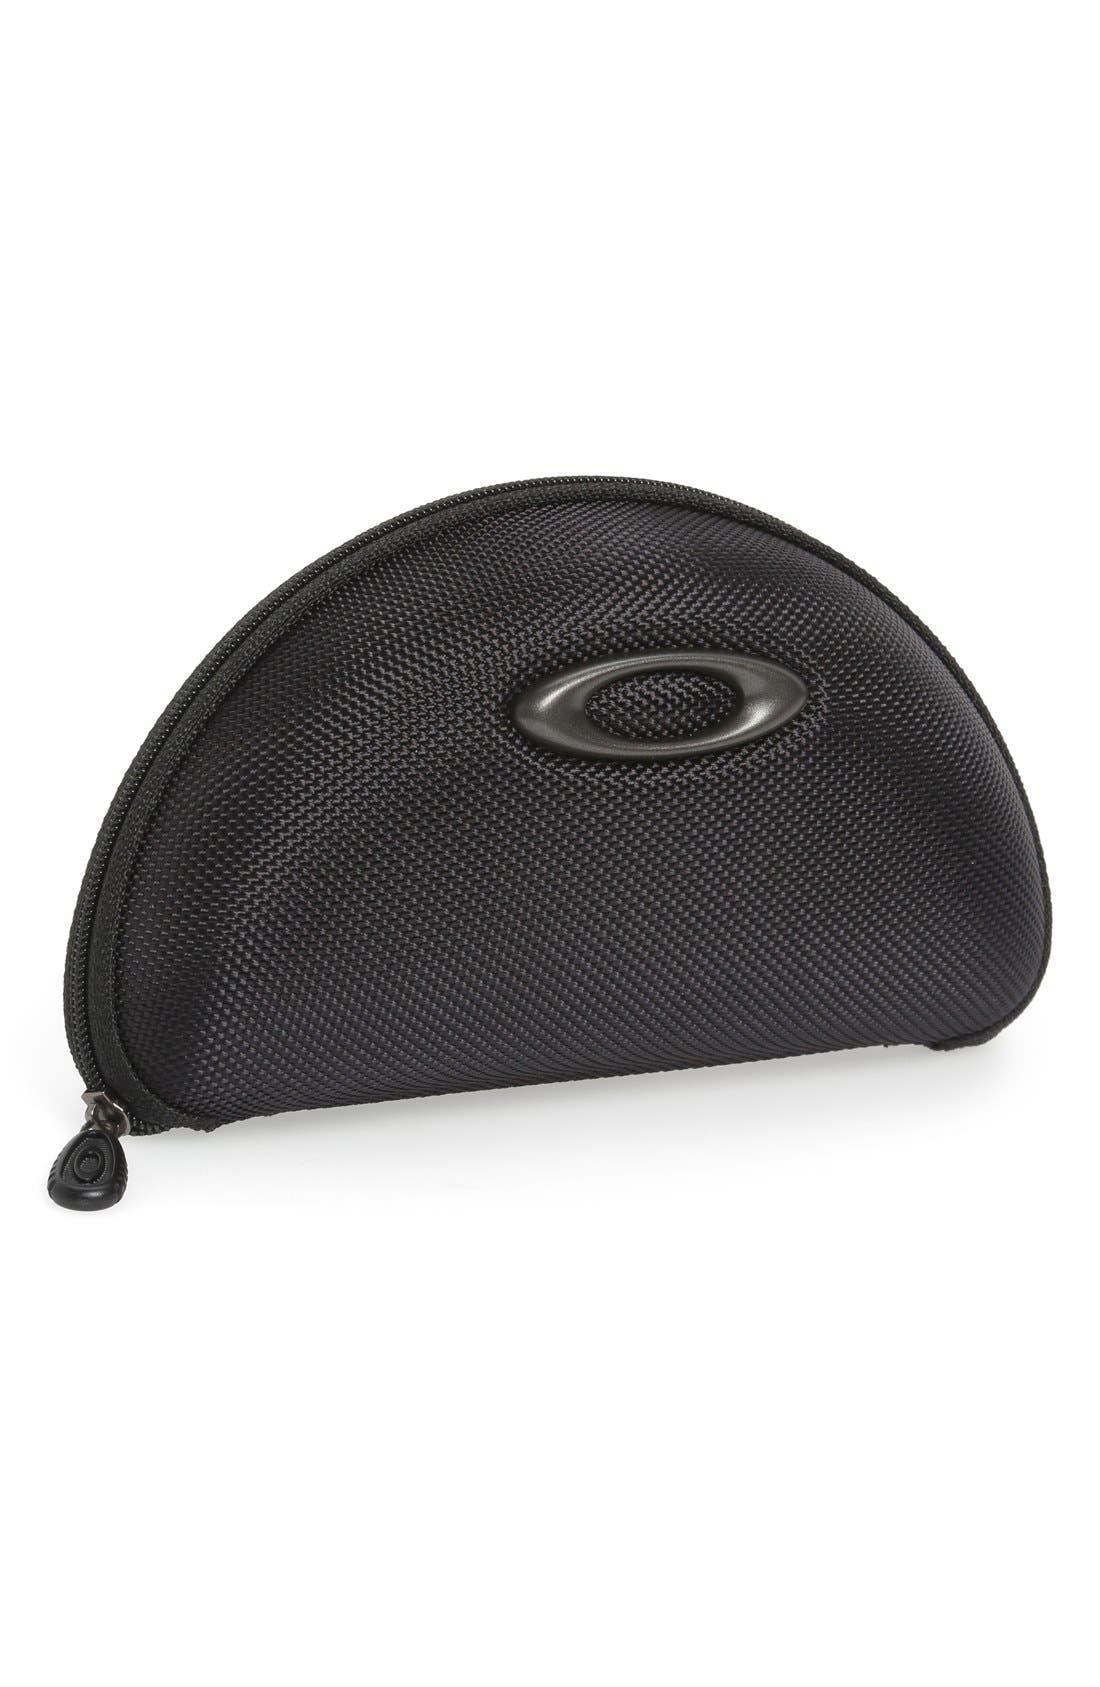 Main Image - Oakley 'Medium Soft Vault' Reinforced Nylon Sunglasses Case